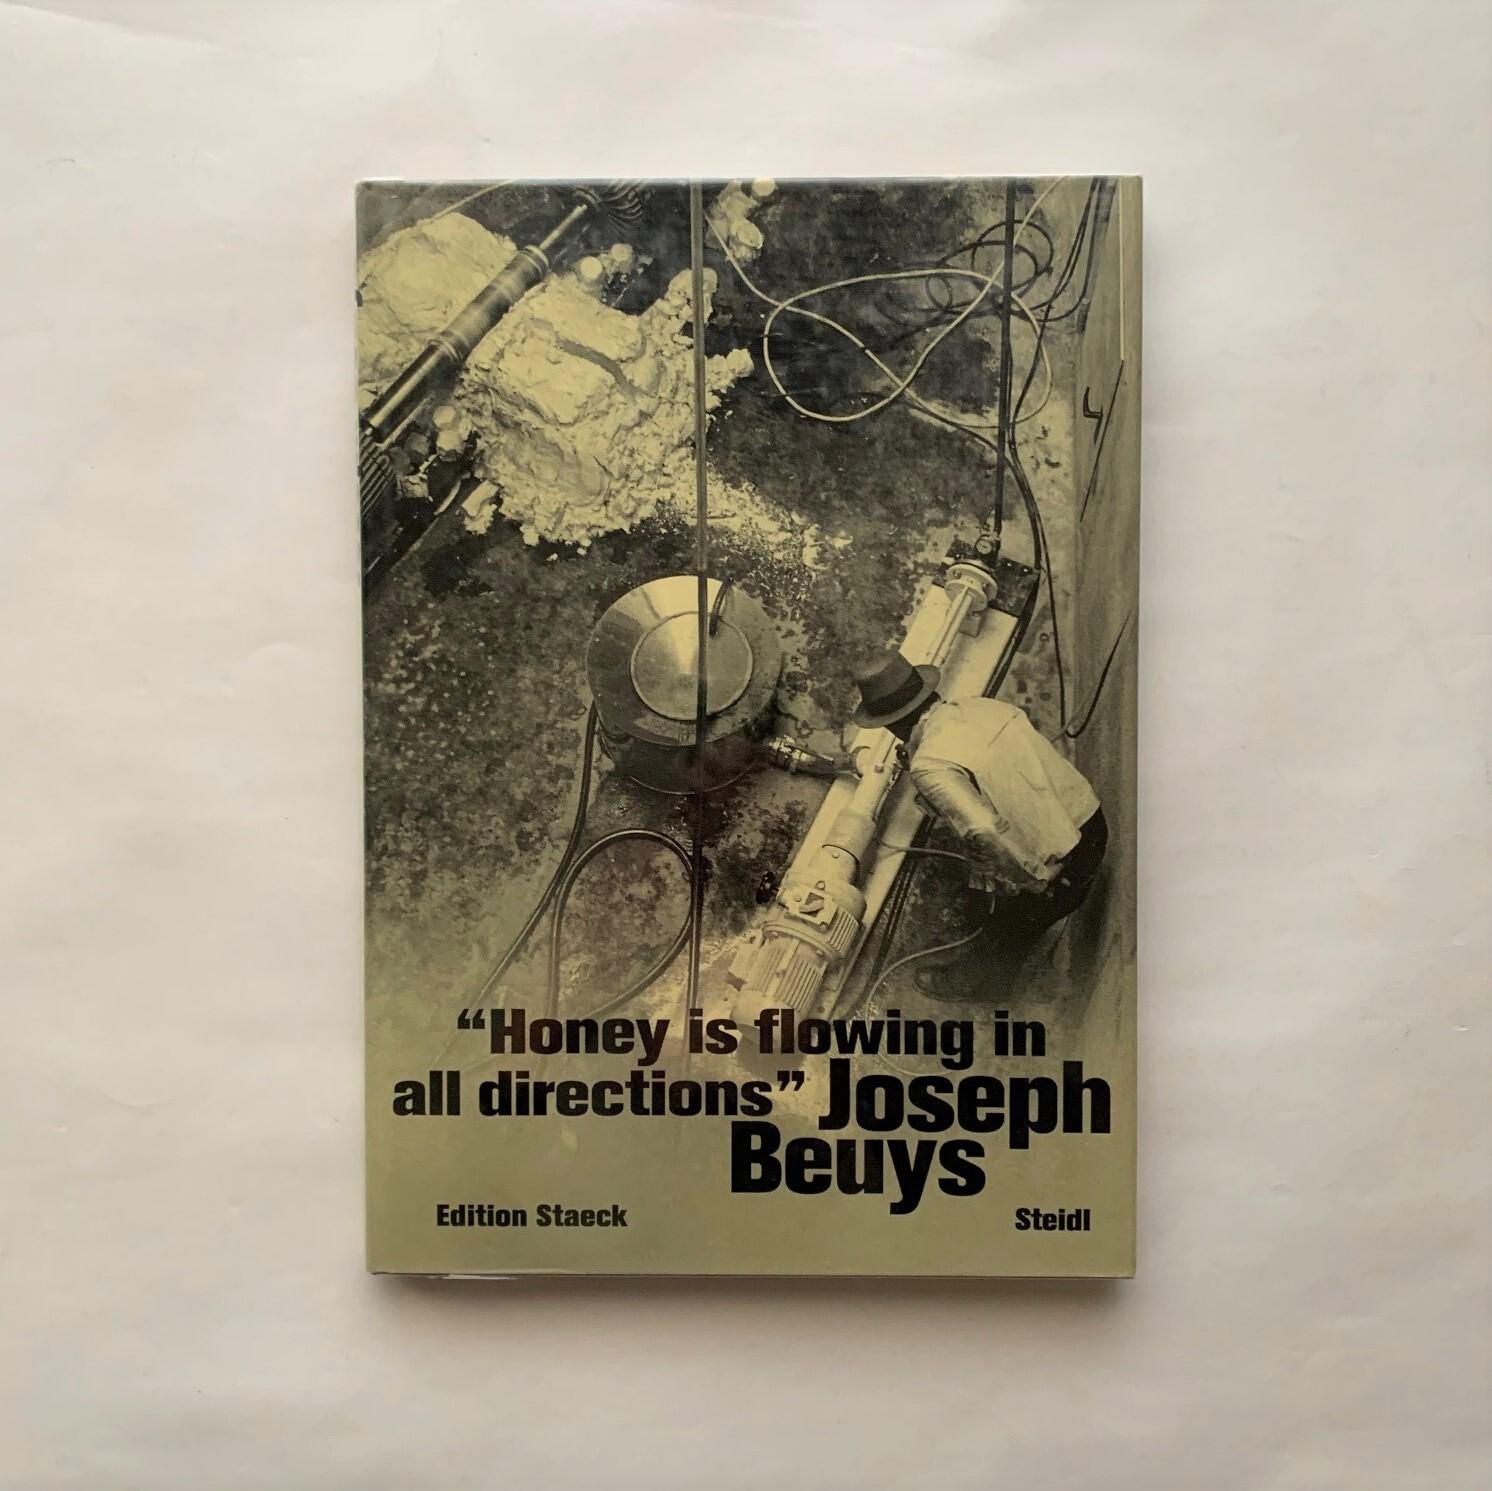 Honey Is Flowing in All Directions / Joseph Beuys  / Gerhard Steidl  / Klaus Staeck